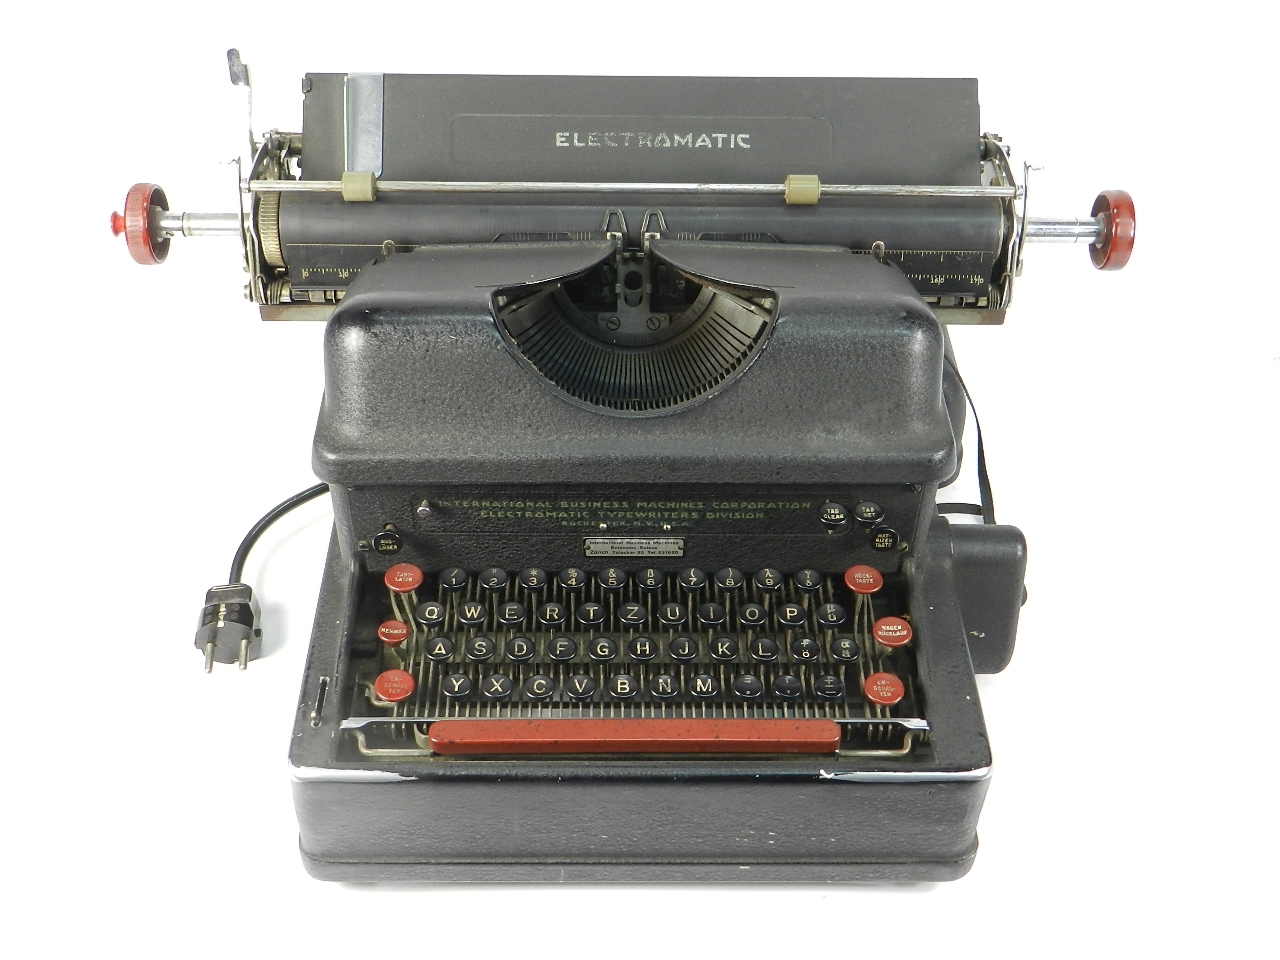 Imagen IBM ELECTROMATIC AÑO 1935 40289